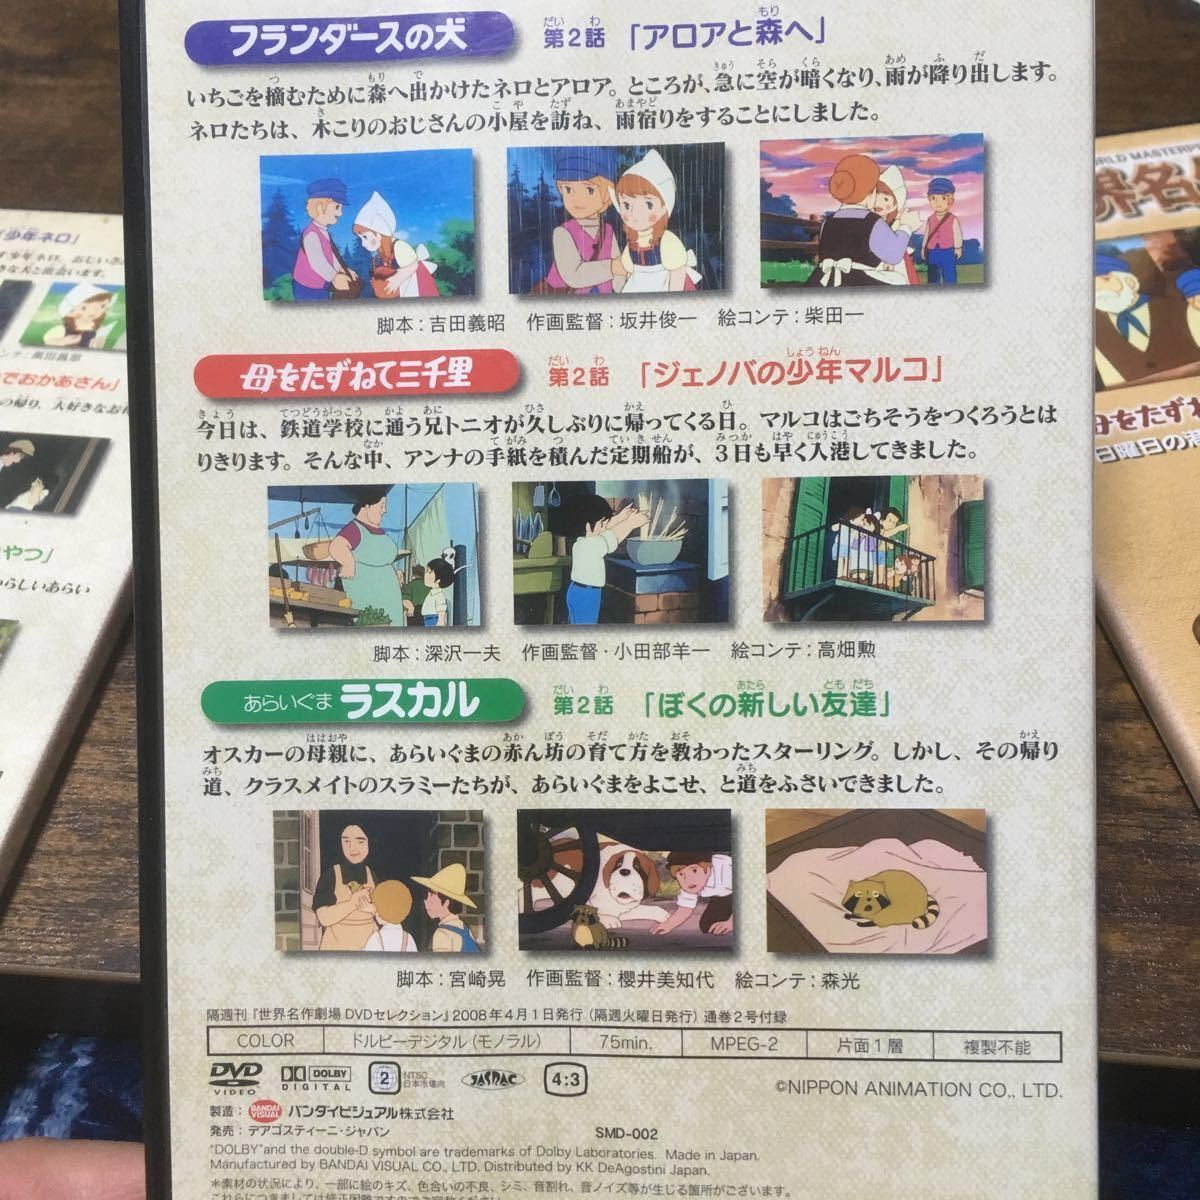 世界名作劇場 DVD 2巻セット